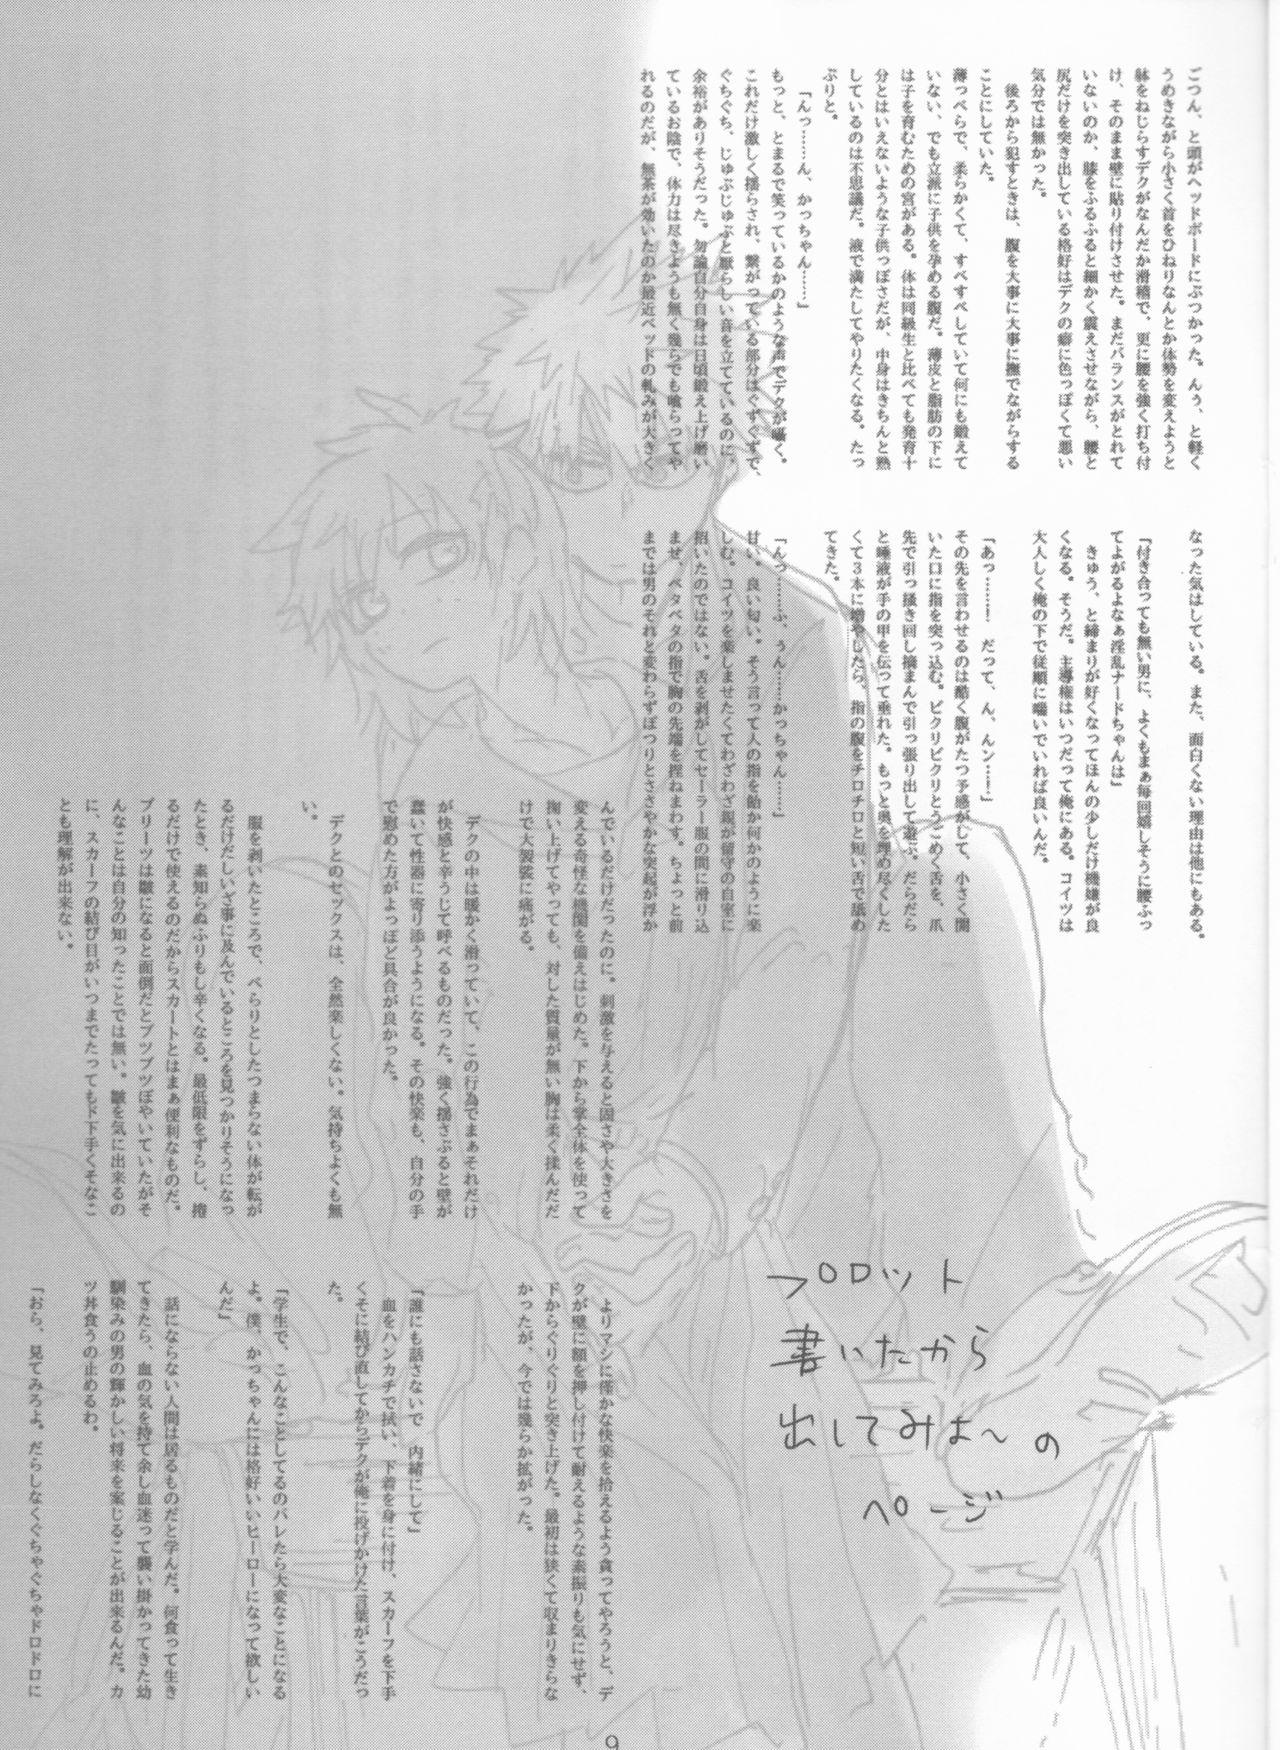 Kayowanu Futari no Kansoukyoku 8